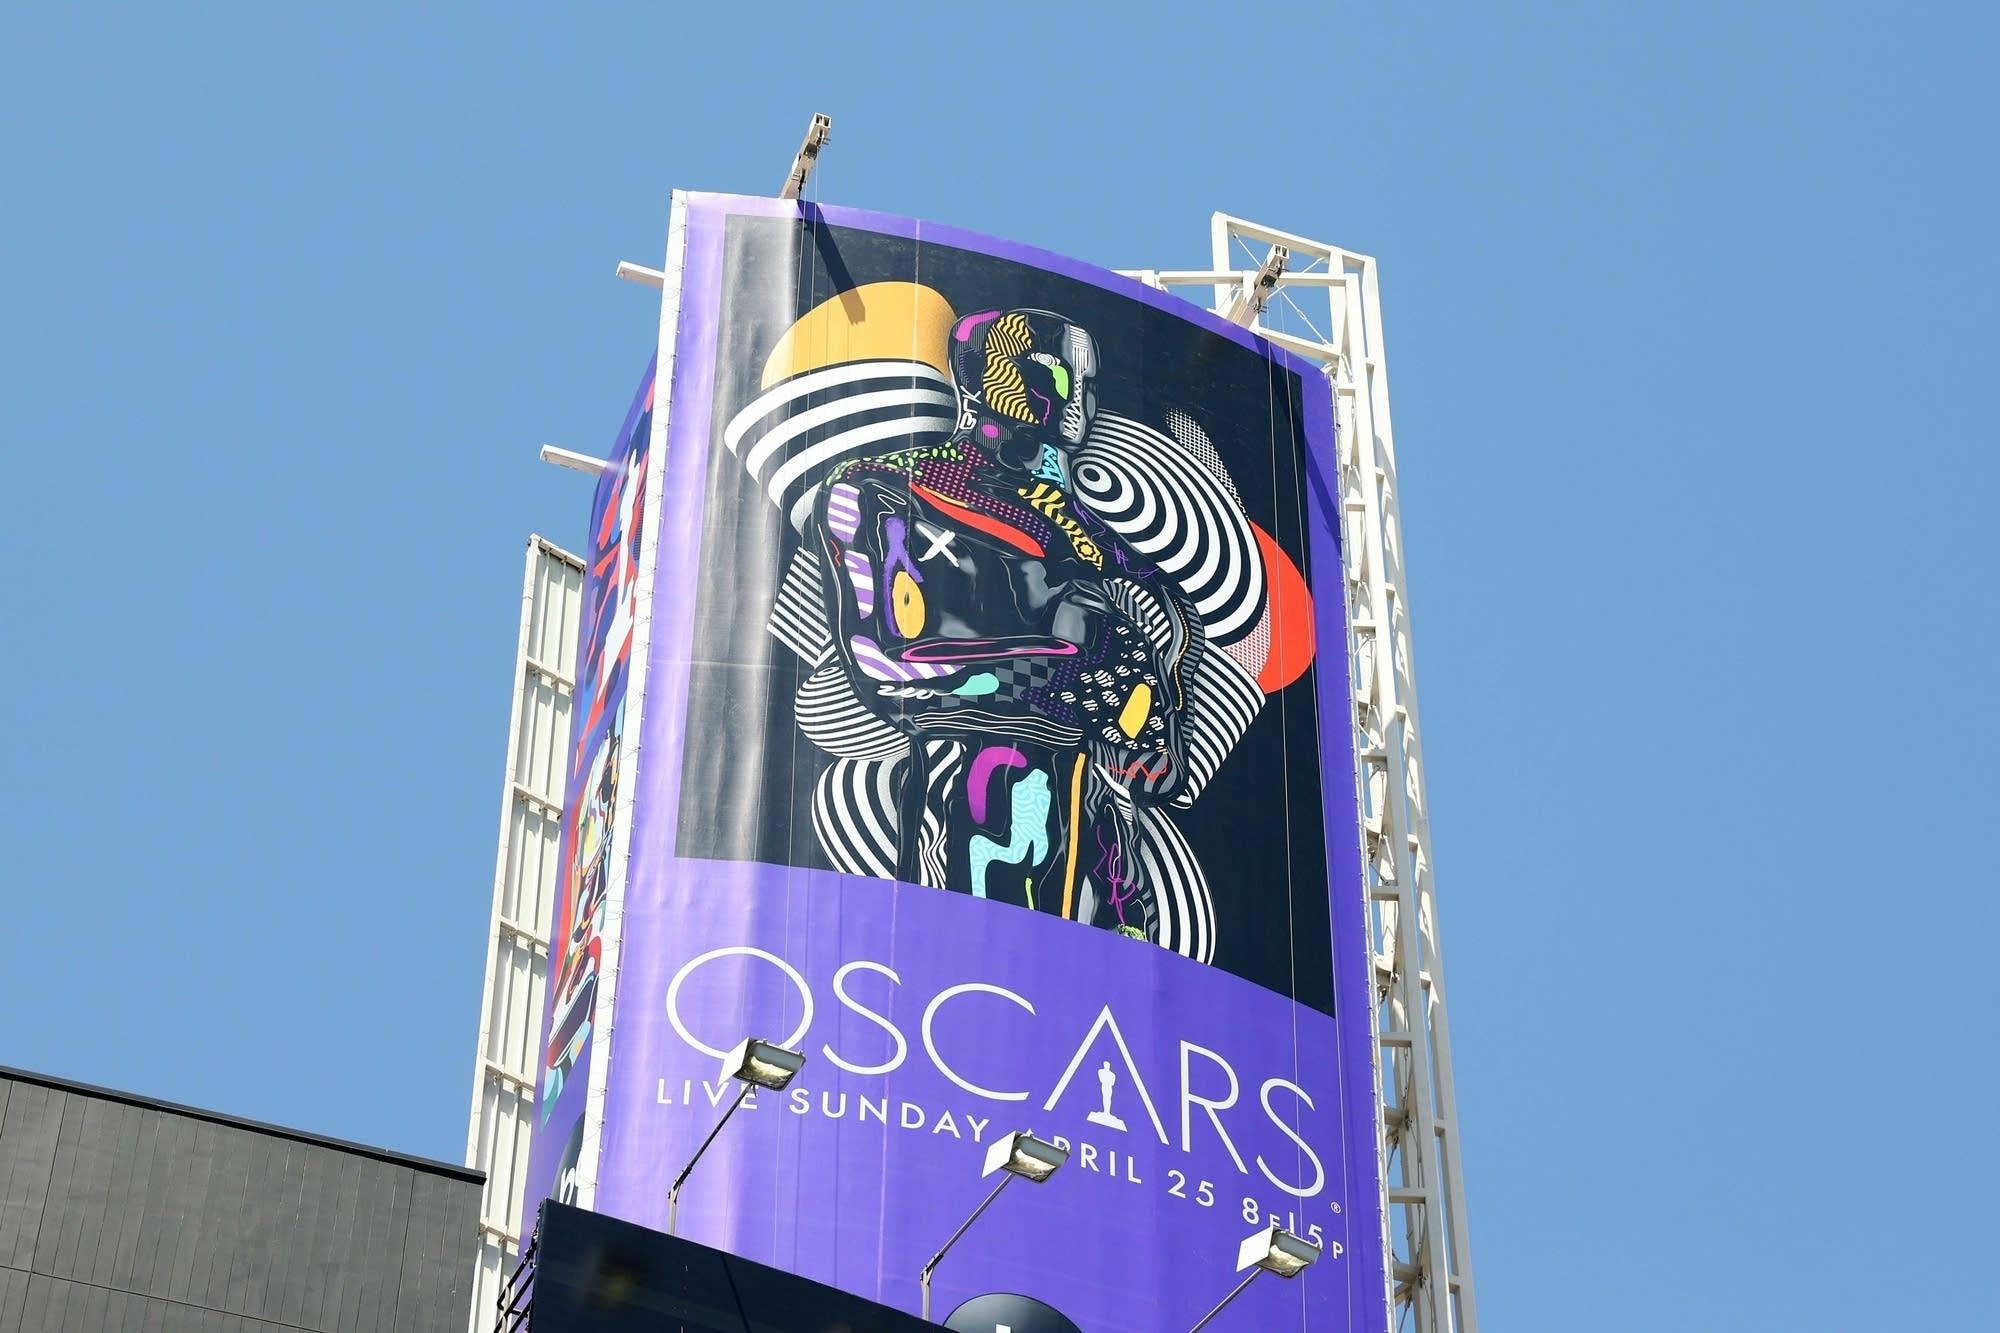 Oscars statuette image